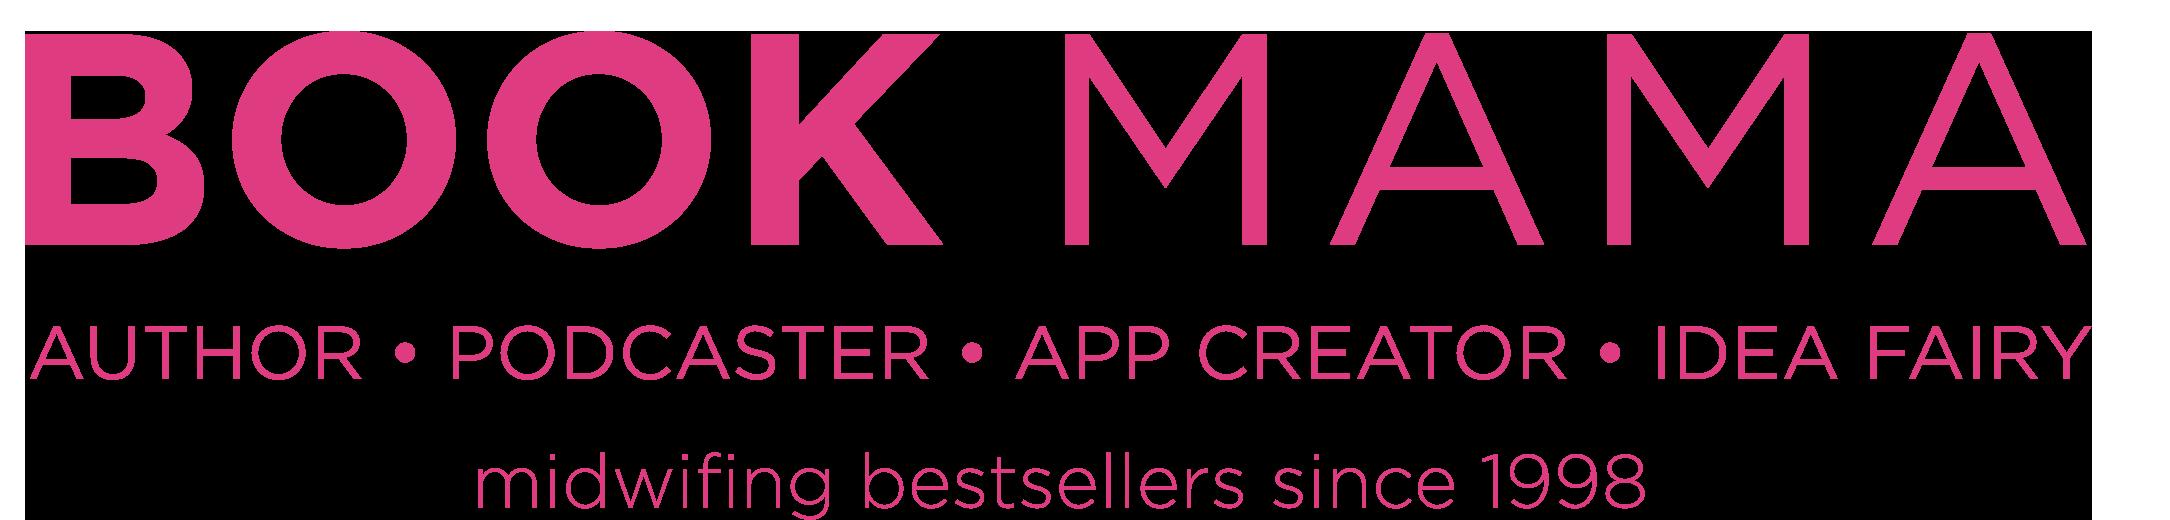 Bookmama Pink version PNG